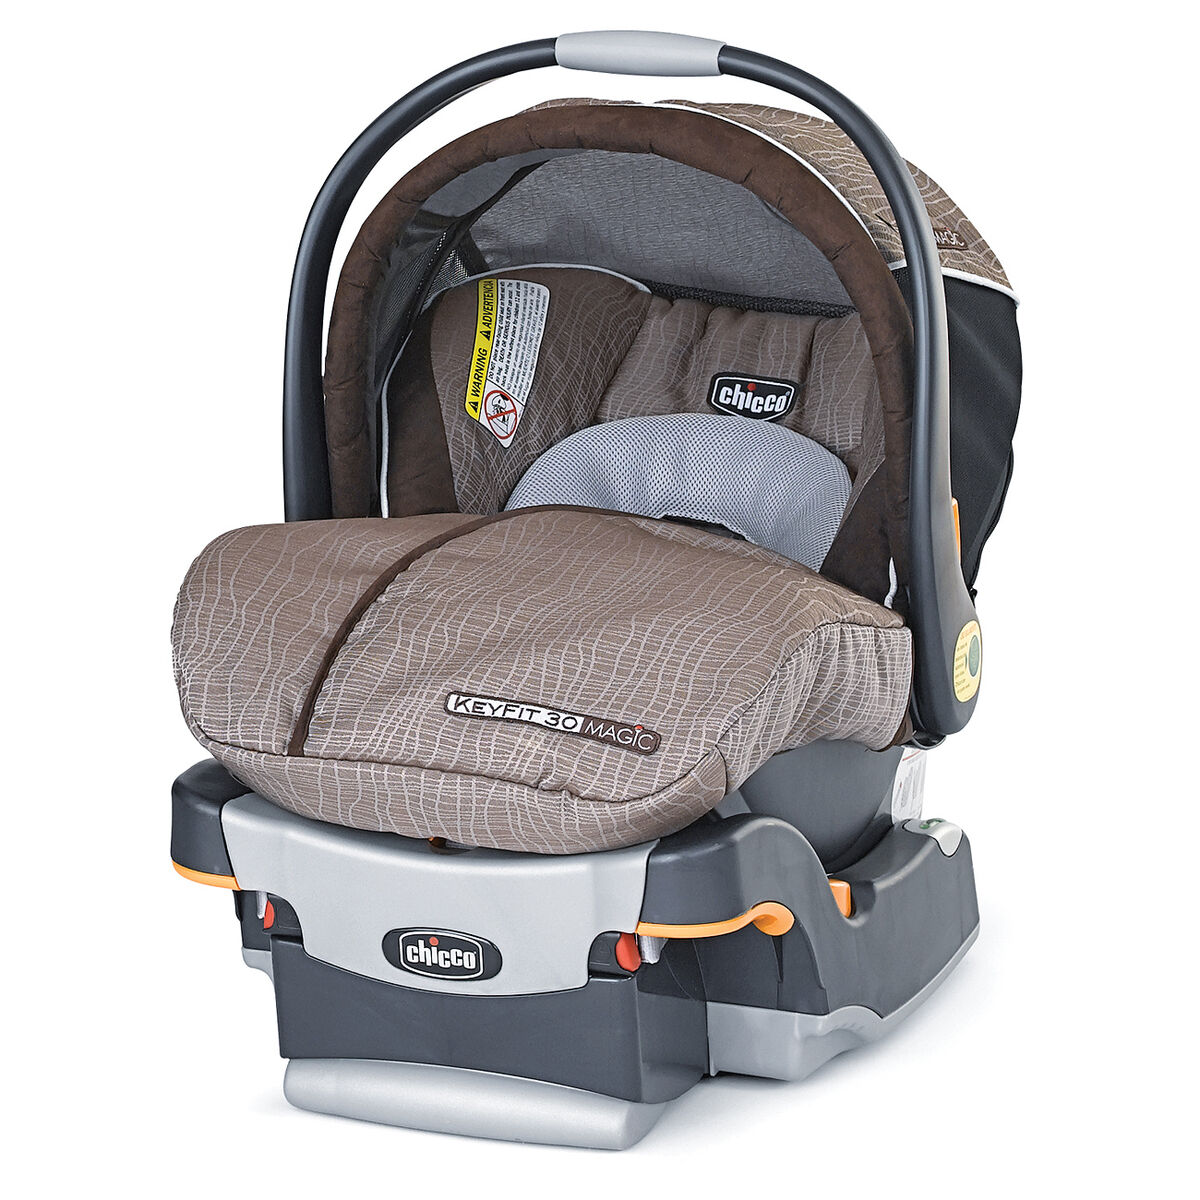 Chicco Keyfit 30 Infant Car Seat Amp Base Rattania